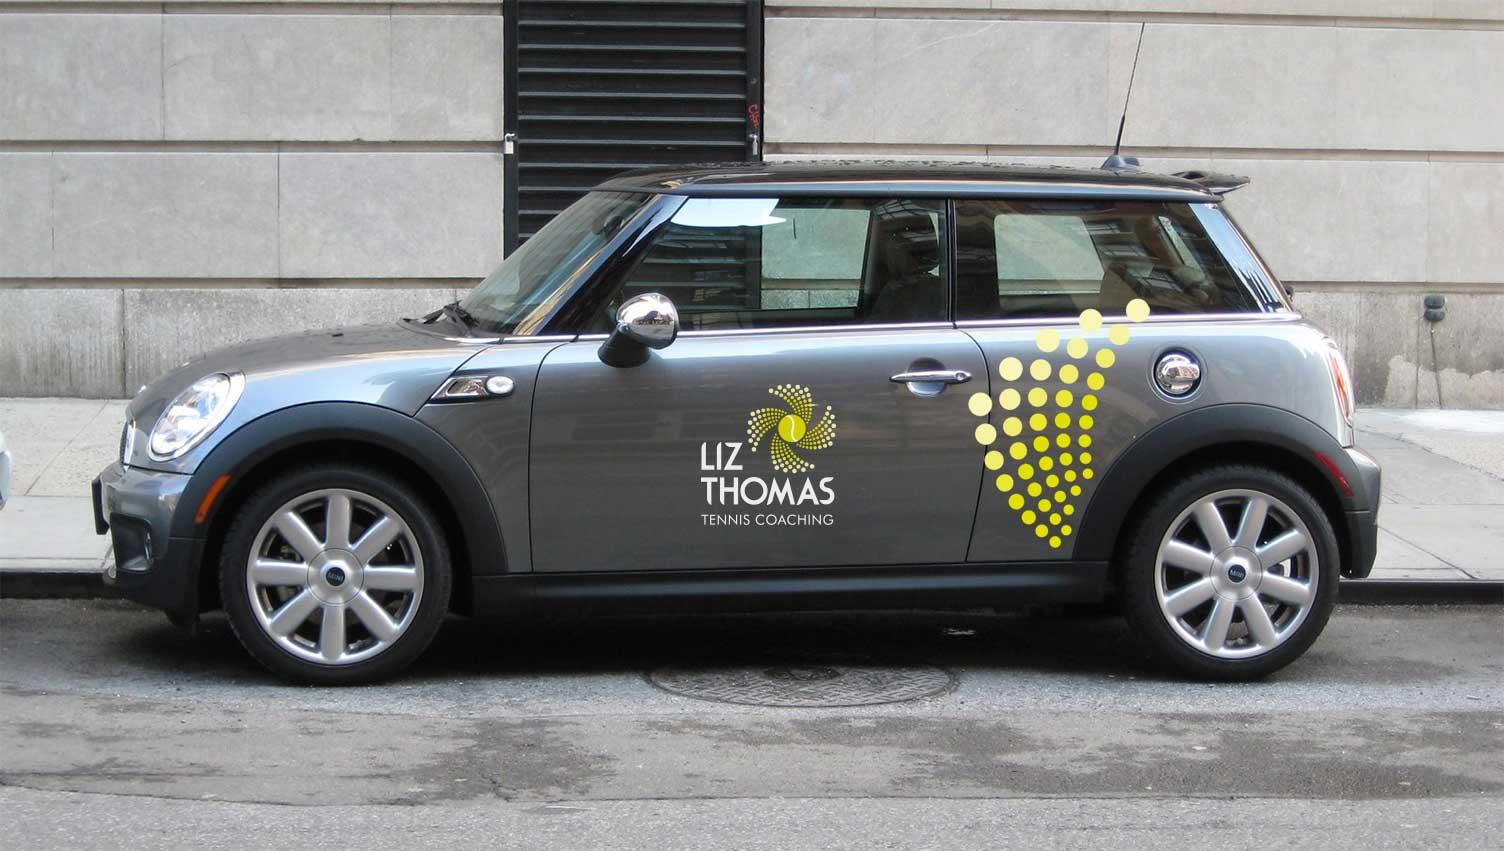 Liz Thomas Brand Identity - Vehicle graphics